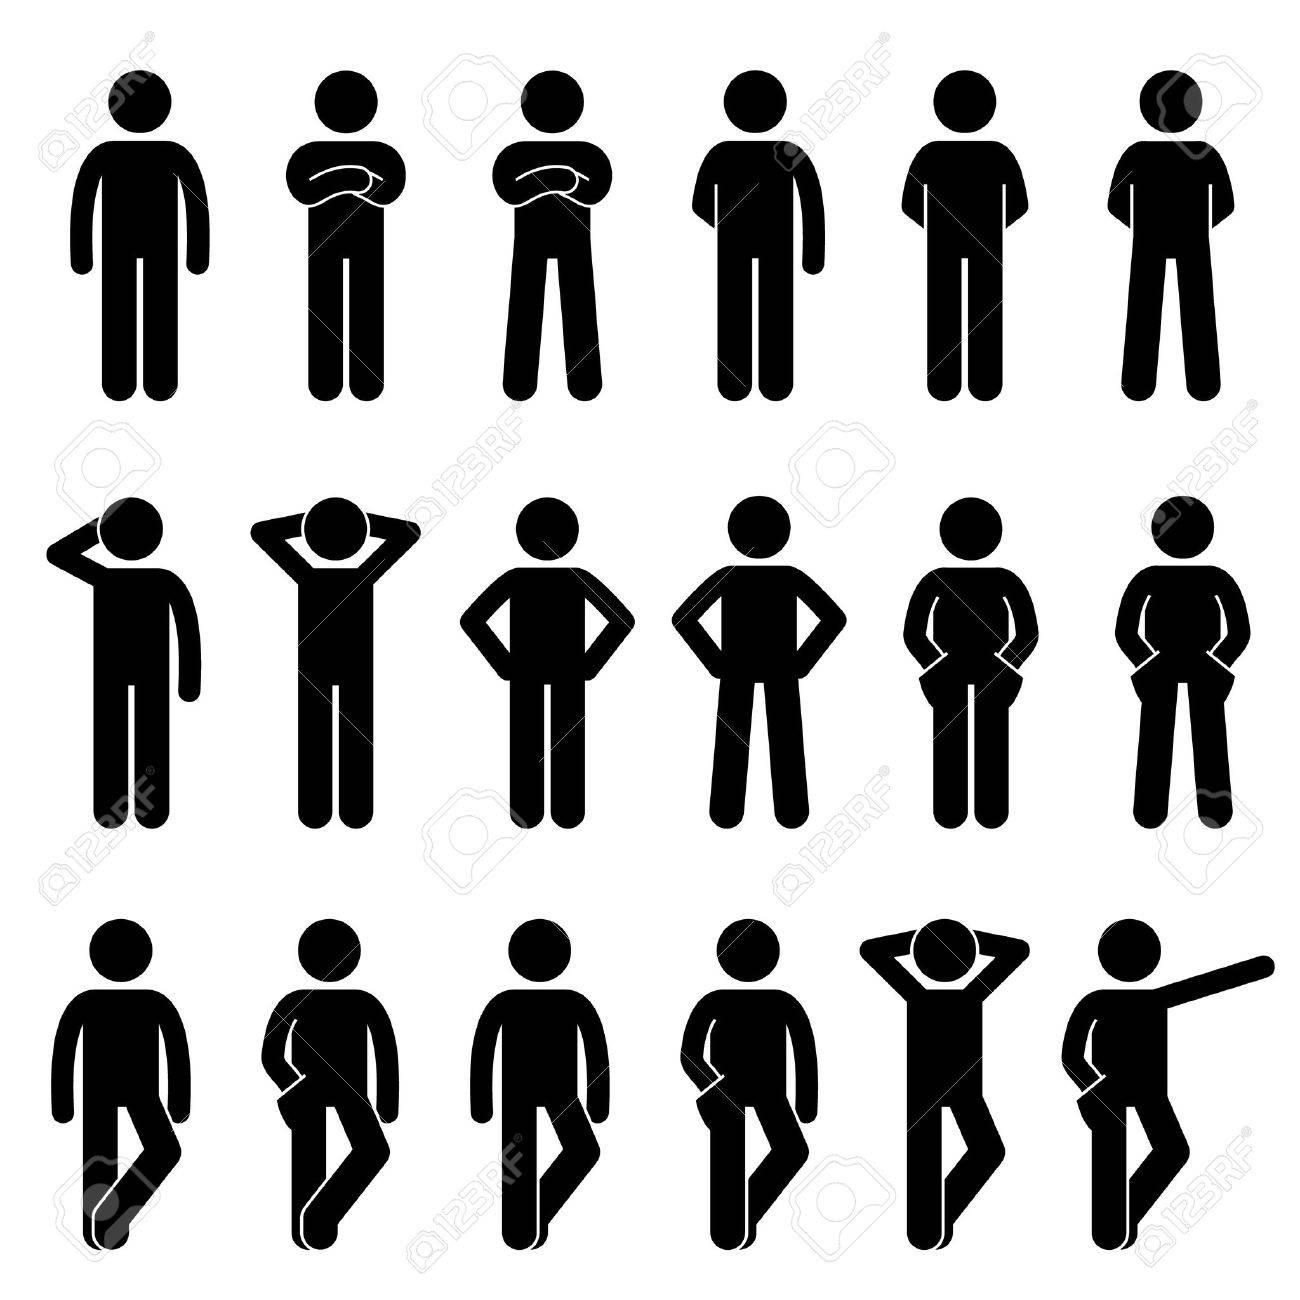 Various Basic Standing Human Man People Body Languages Poses Postures Stick Figure Stickman Pictogram Icons Set - 65860939